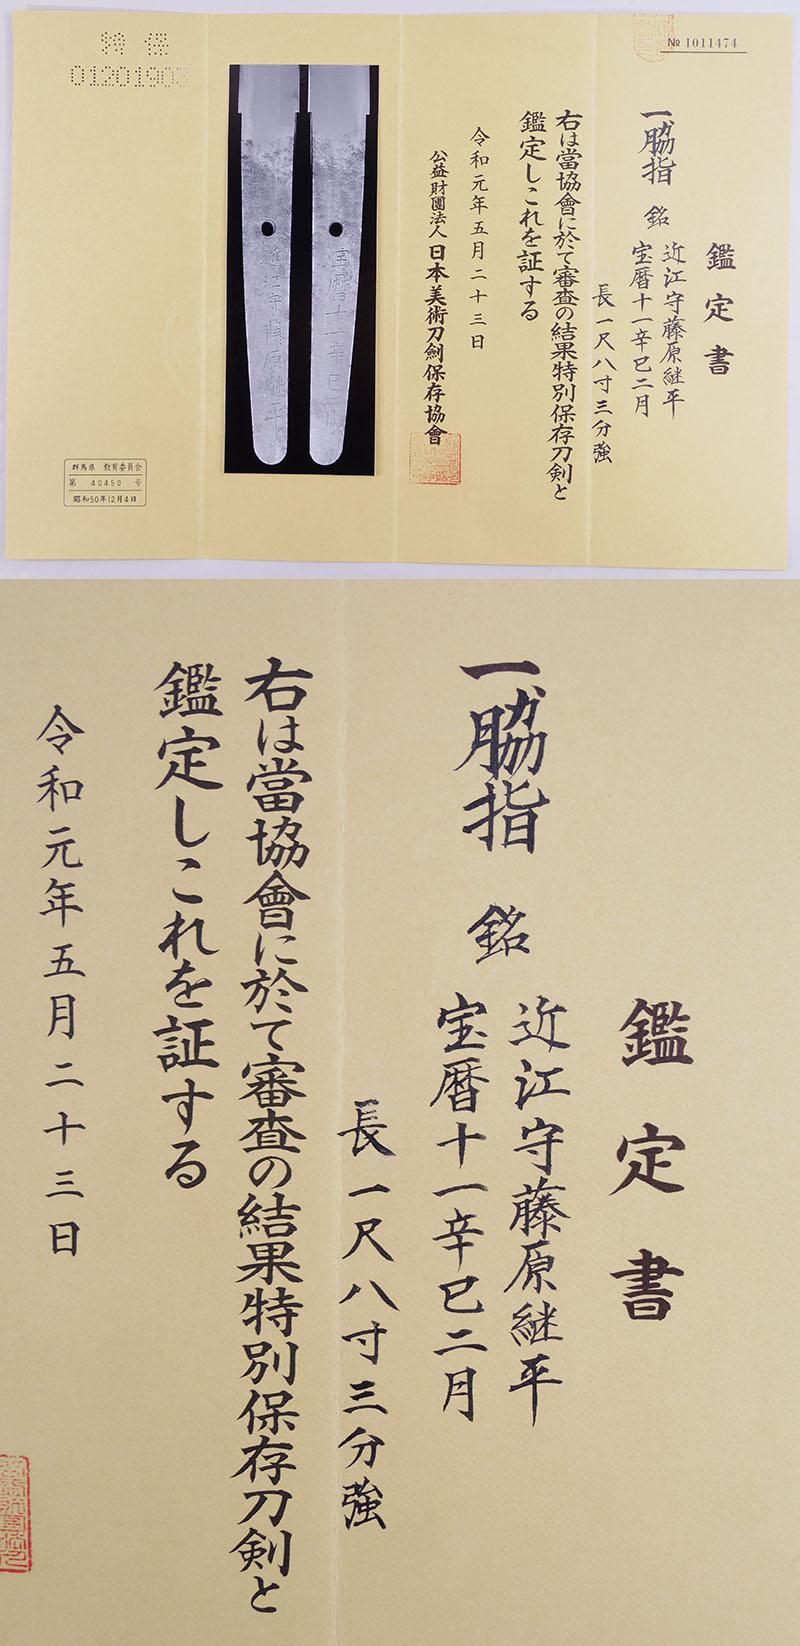 近江守藤原継平(三代) Picture of Certificate